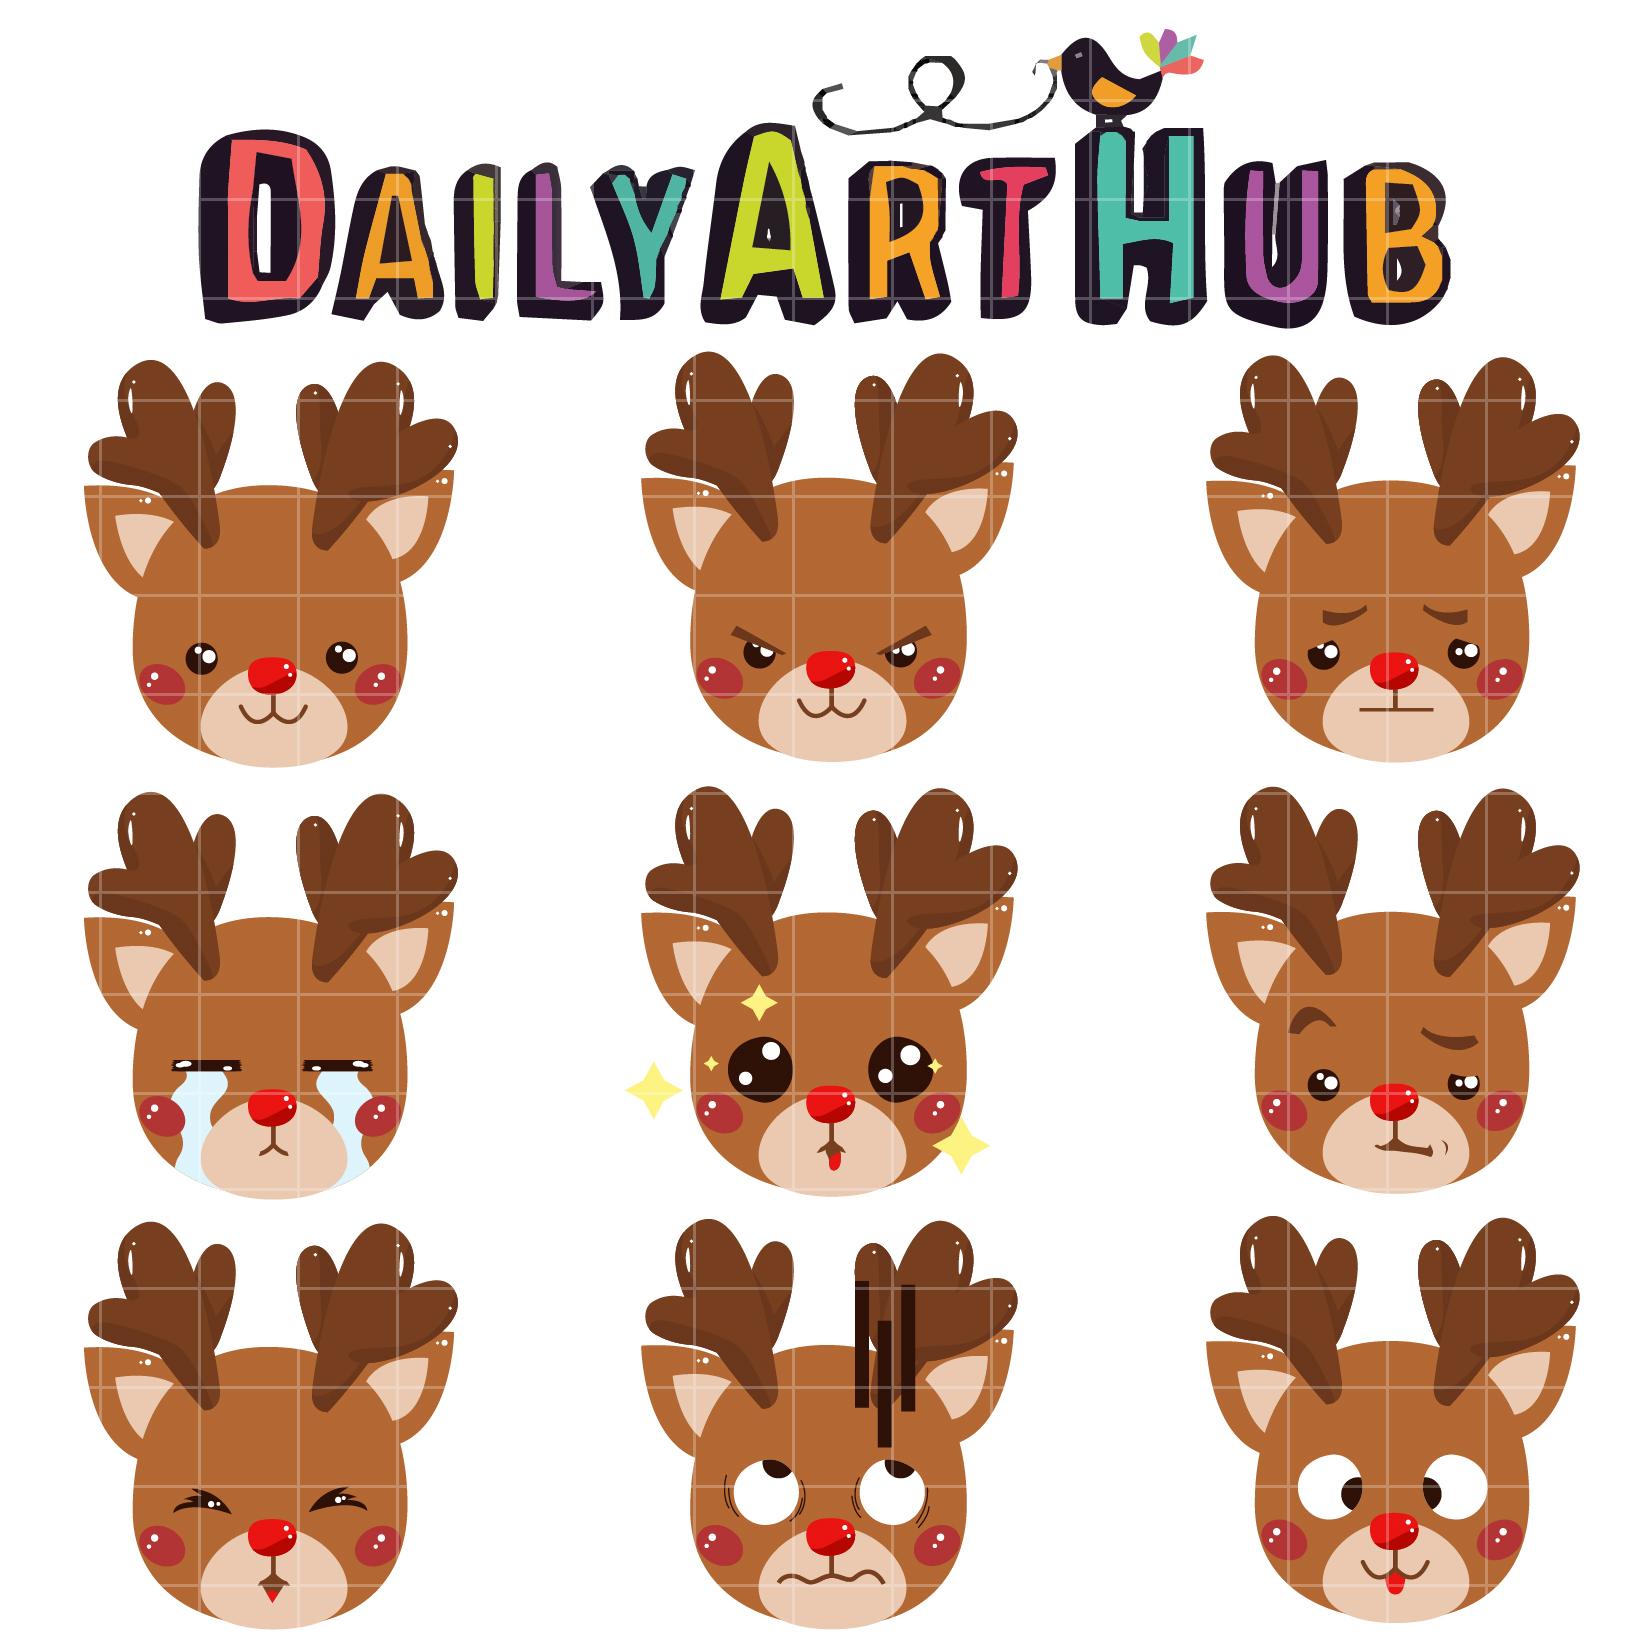 Cute Reindeer Emoticon Clip Art Set – Daily Art Hub – Free ...